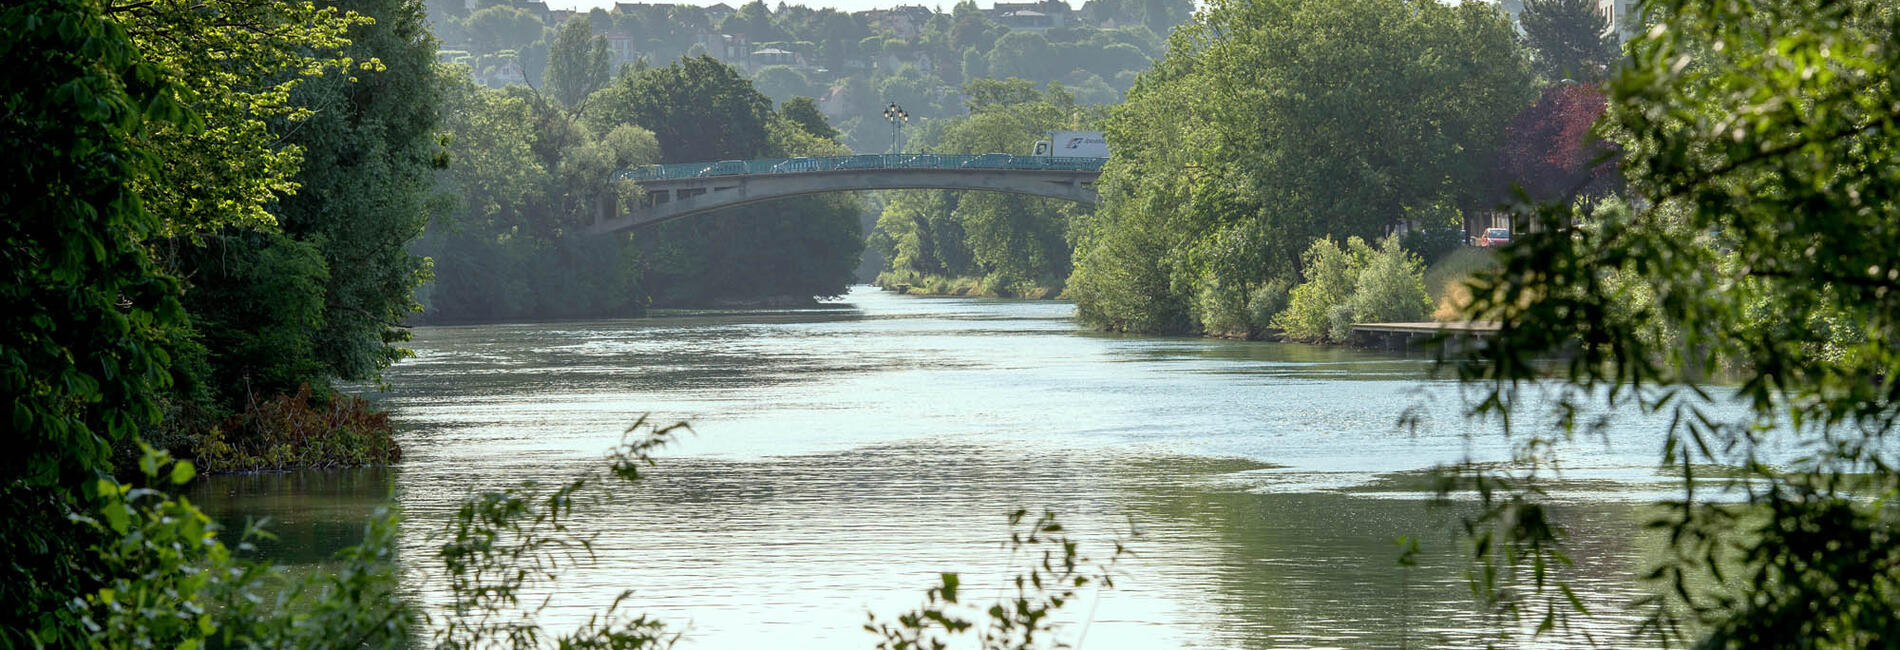 Vue de la Marne à Champigny